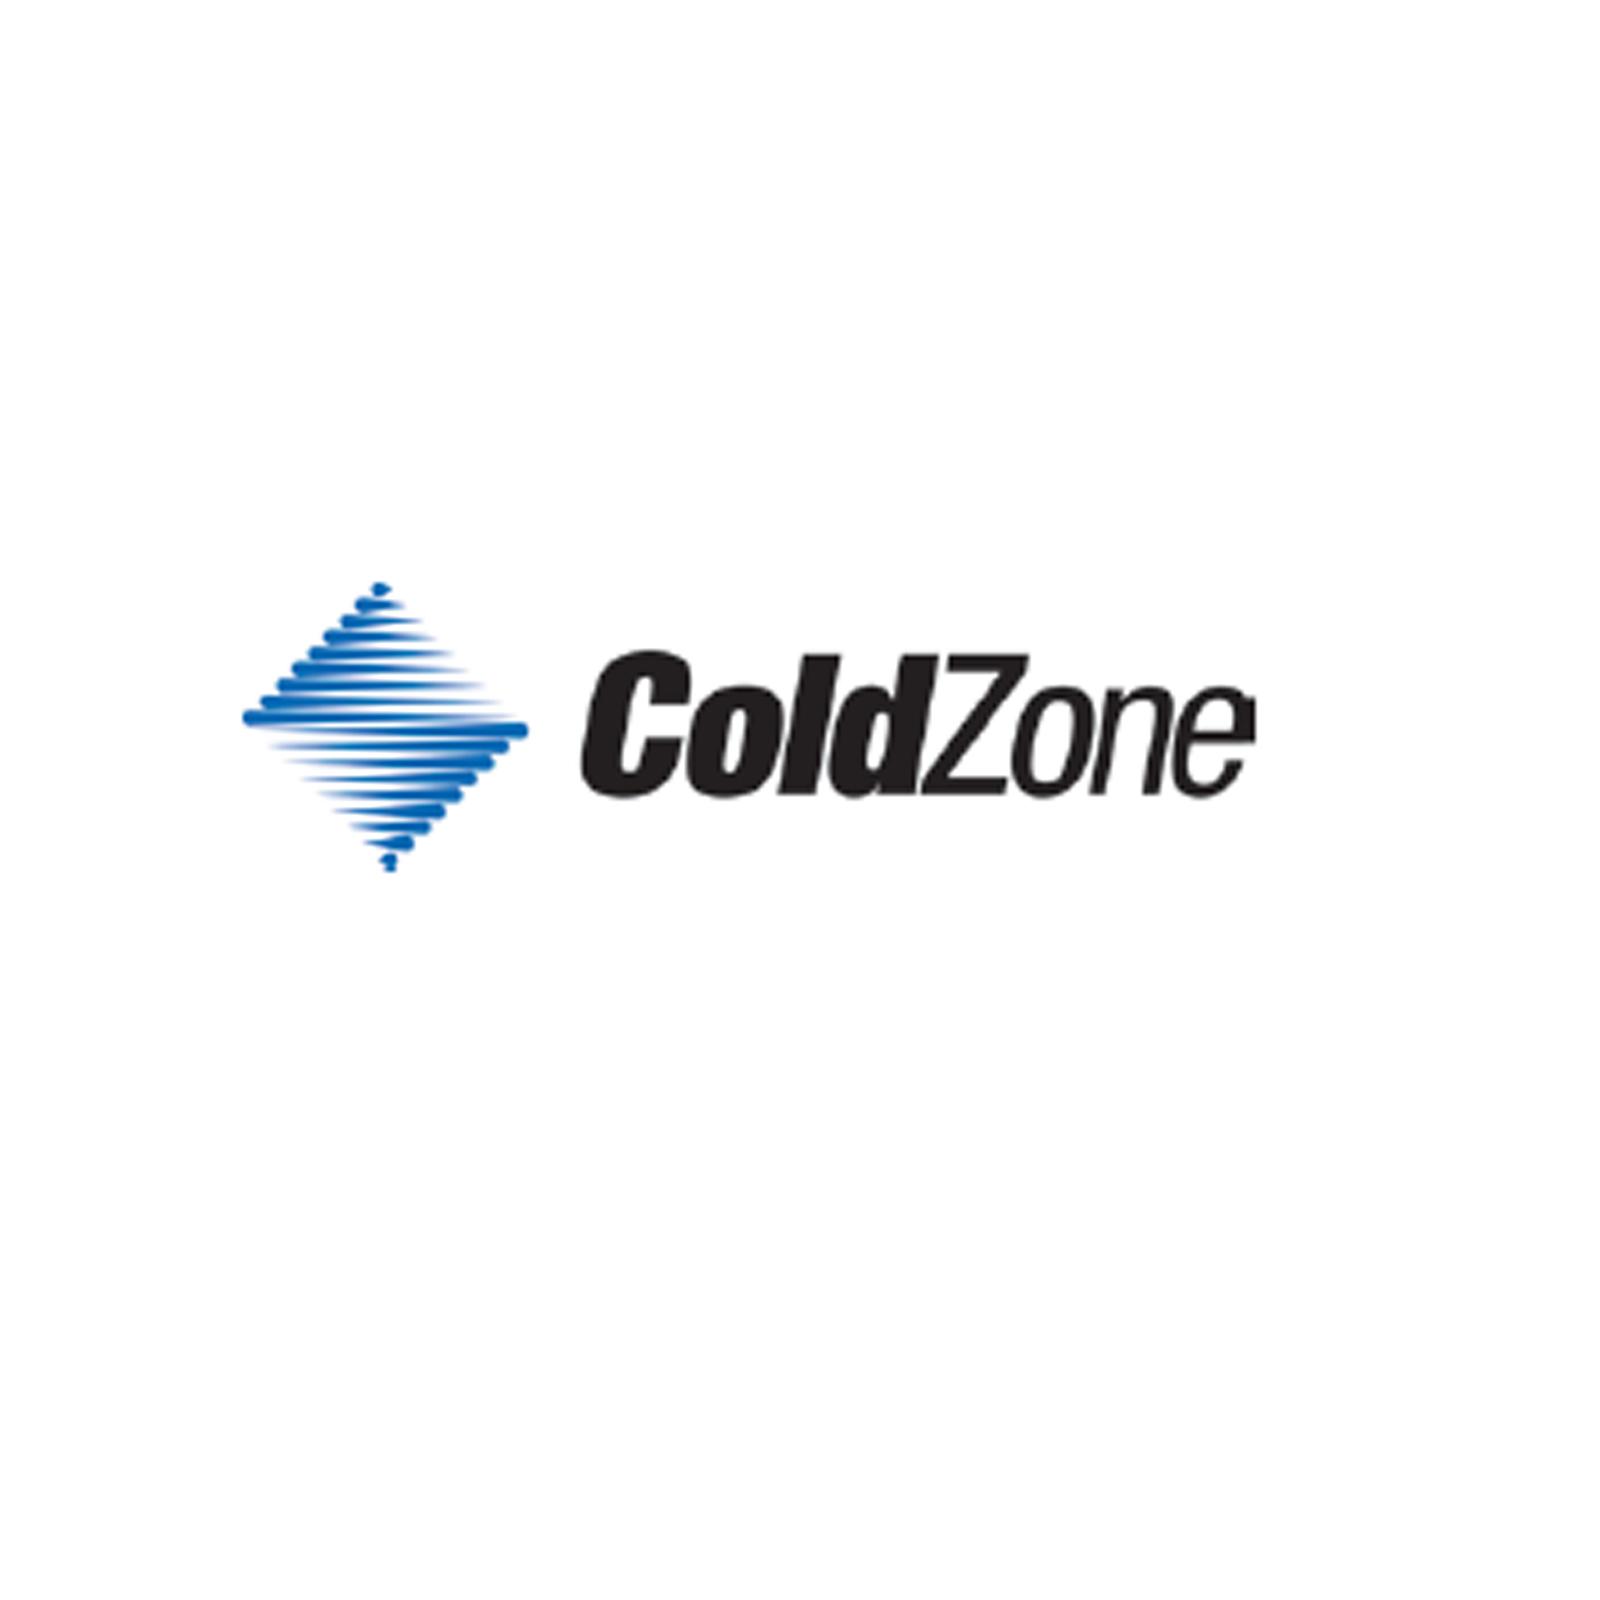 cold zone white.jpg